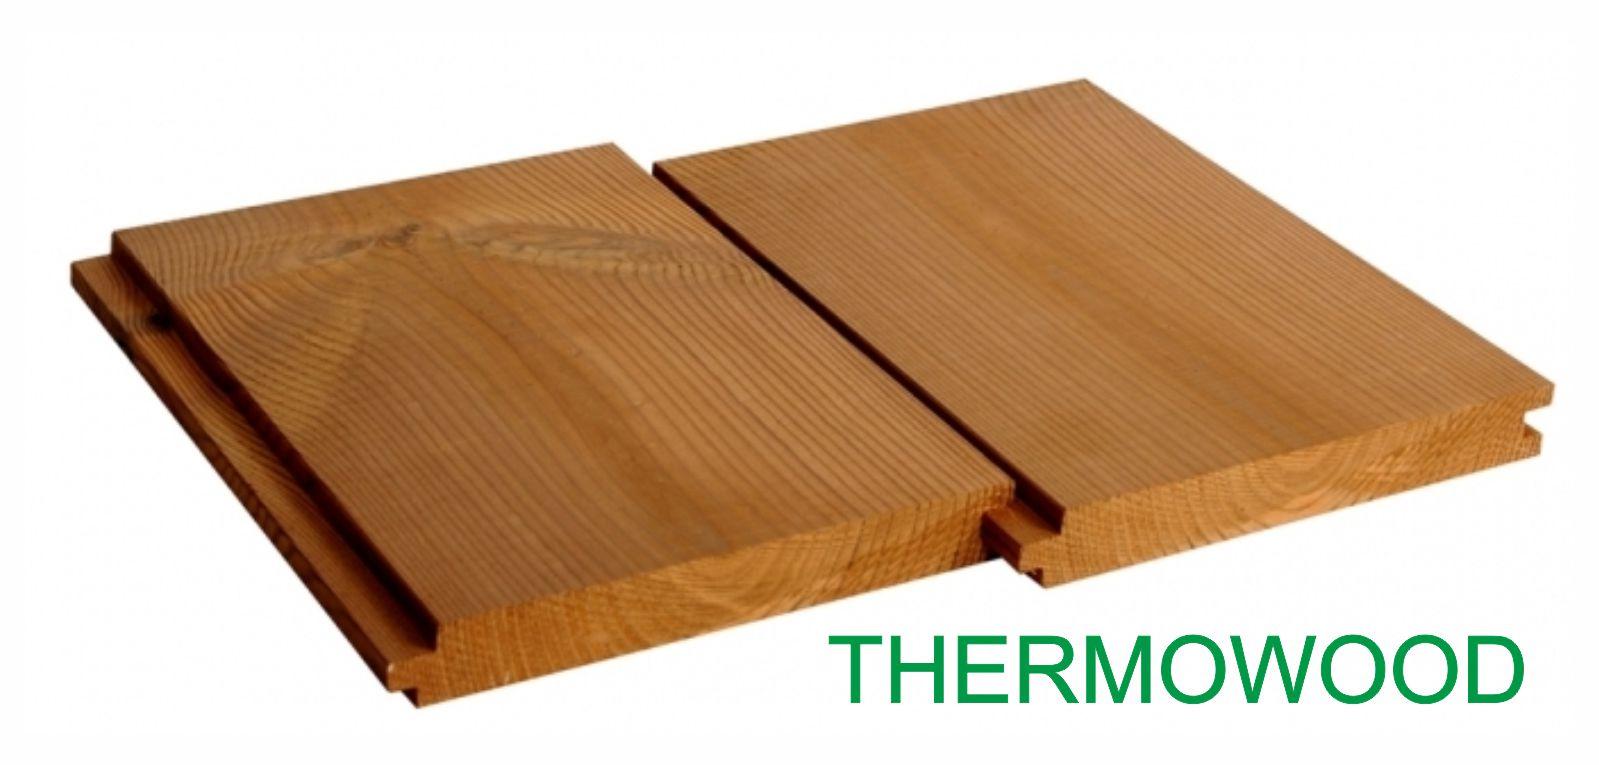 Thermowood, finská borovice, obklady, fasády, terasy